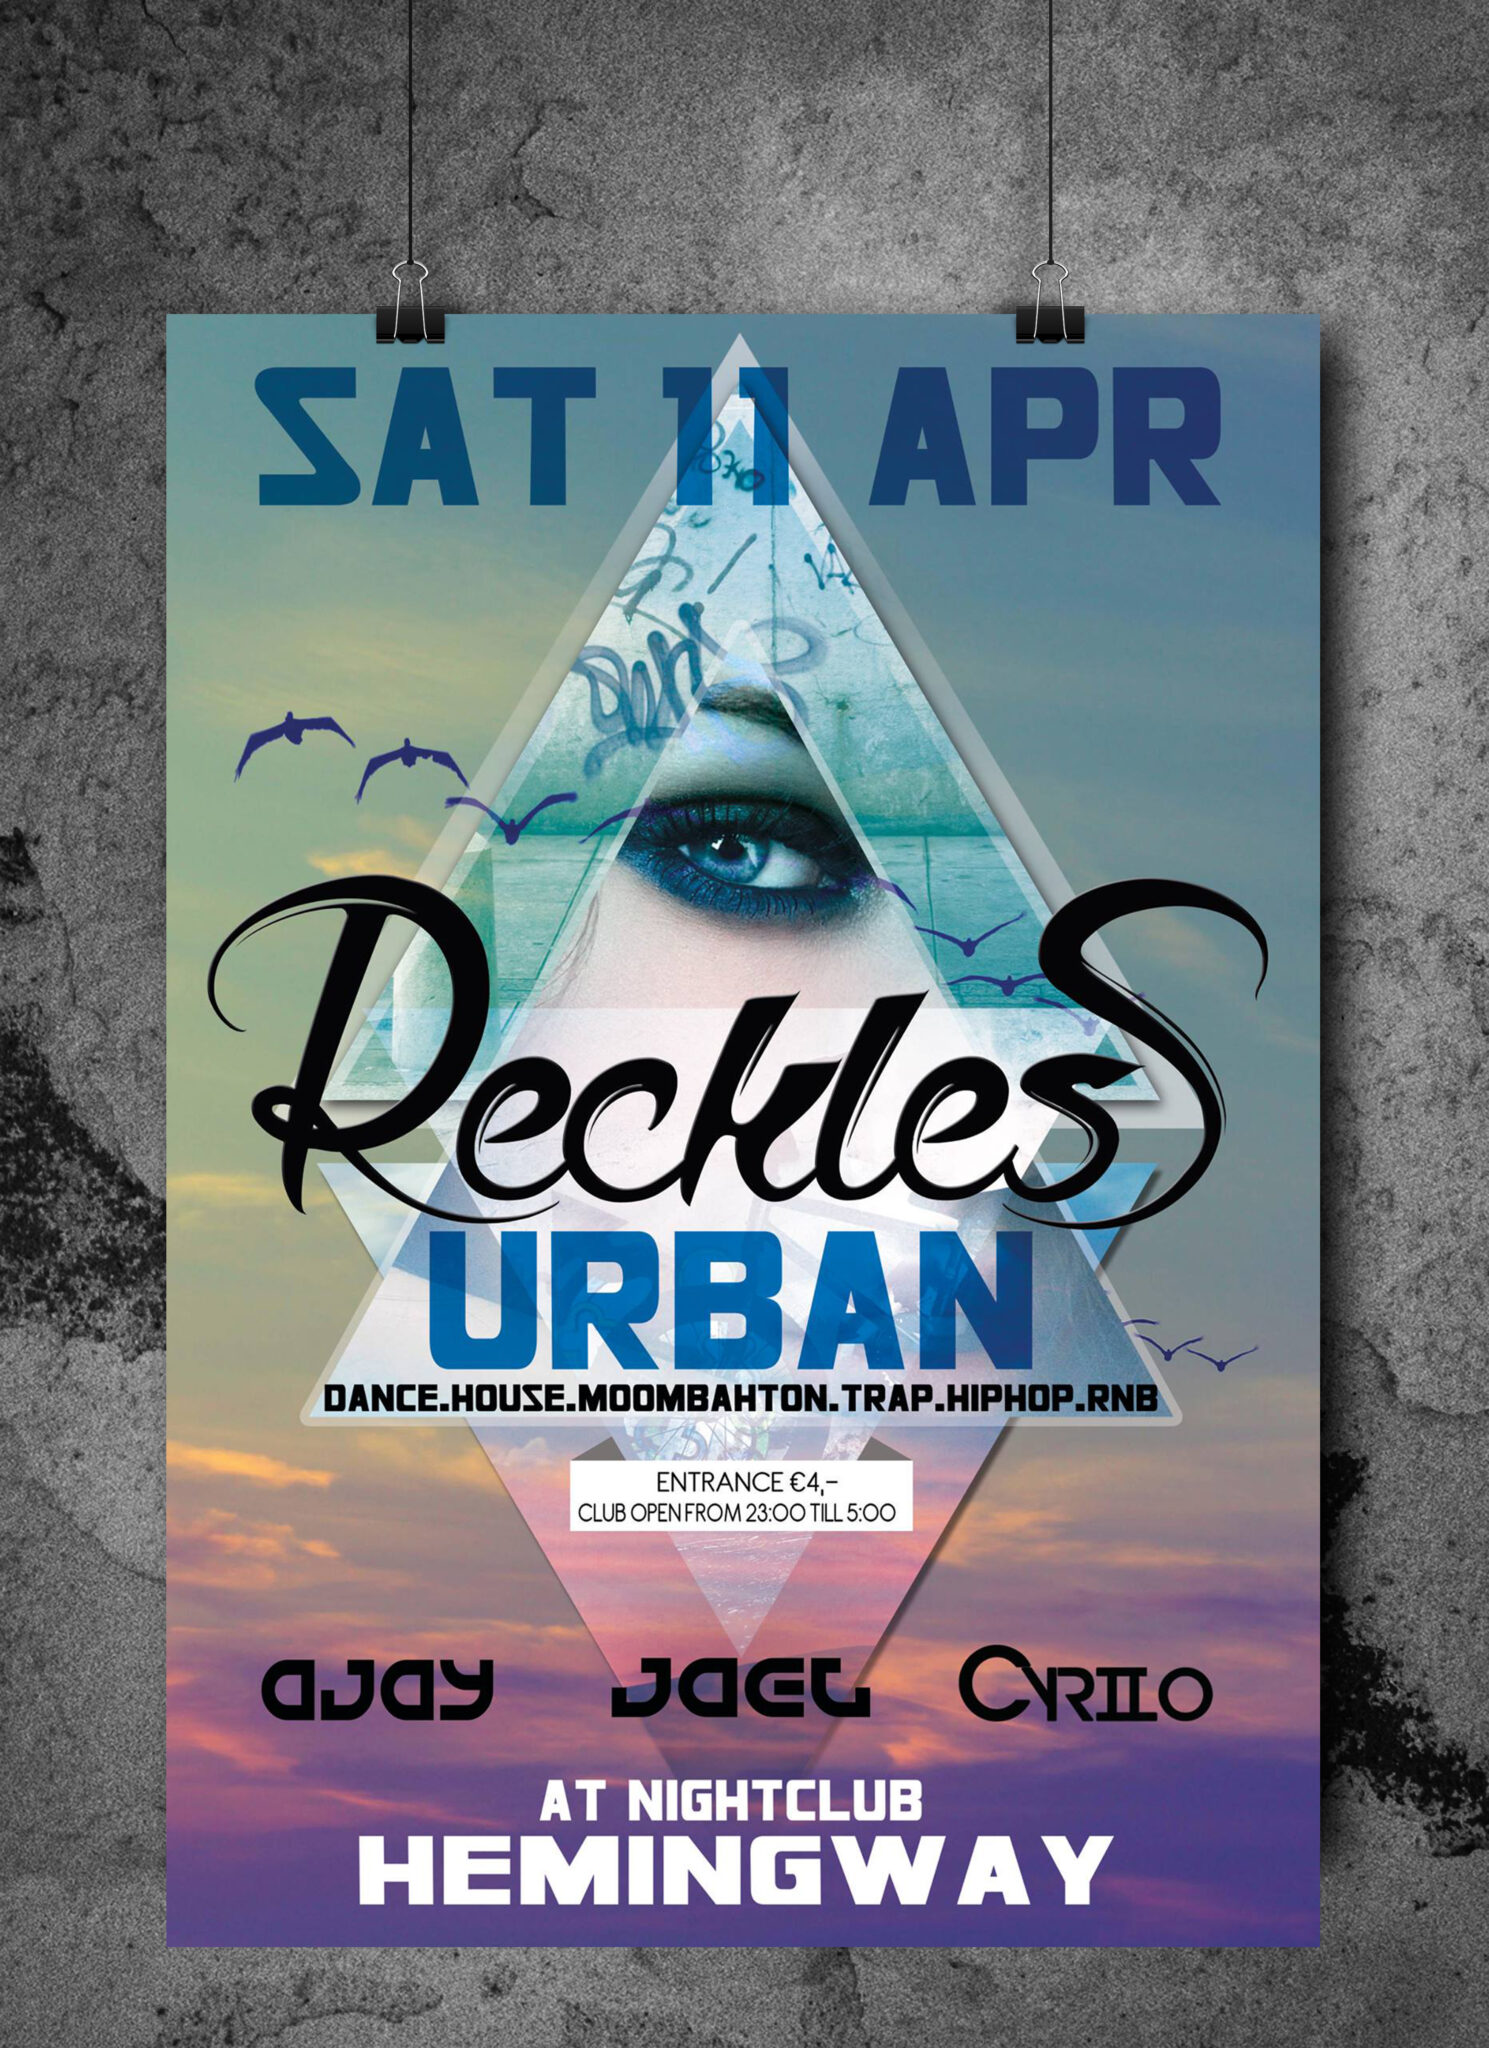 Reckless_Urban